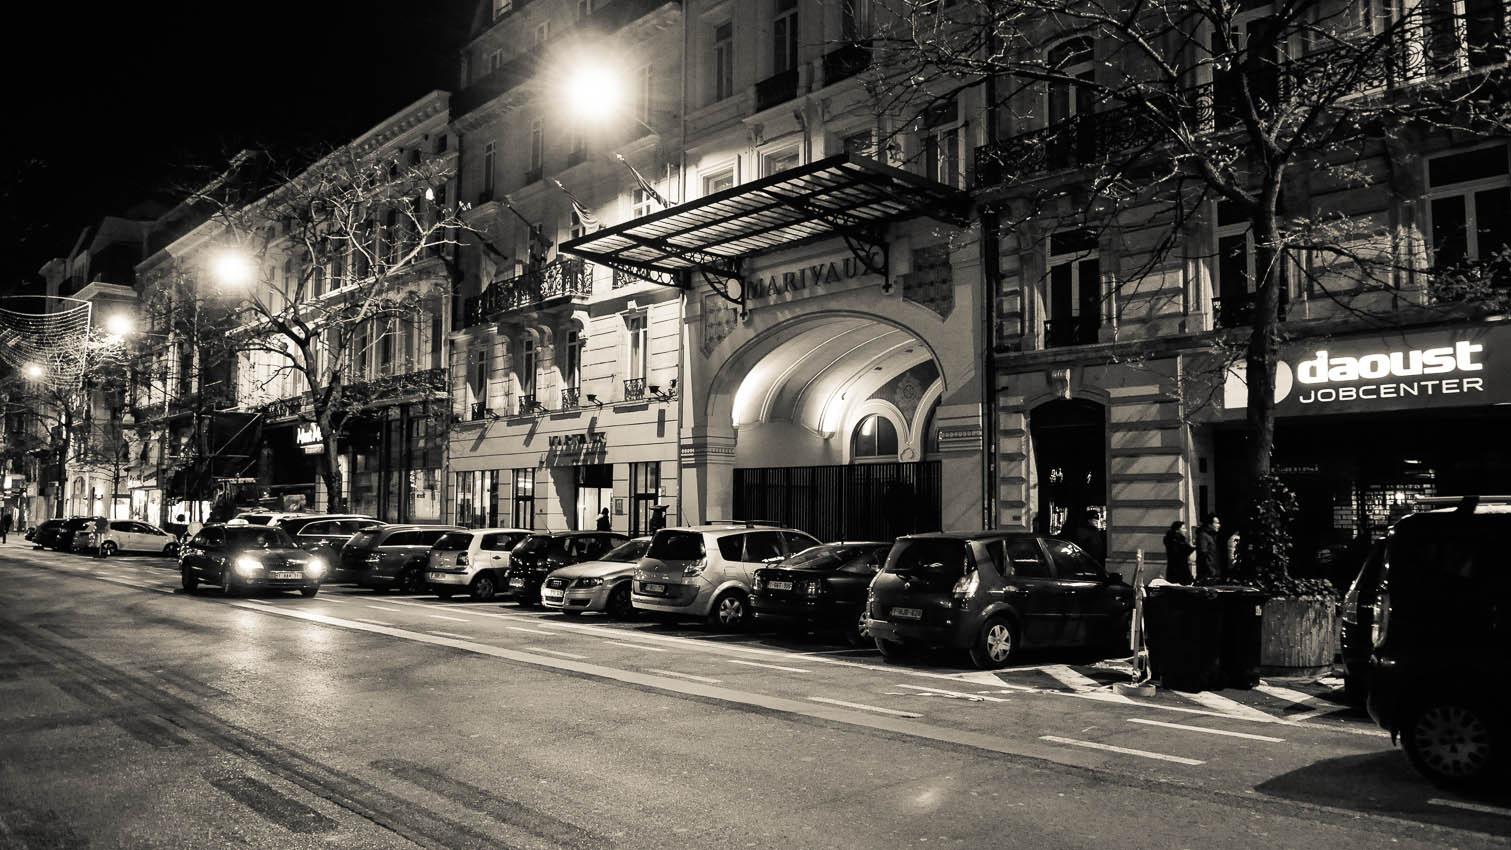 14-route-paysage-location-decors-film-cinema-photo-belgium-bruxelles